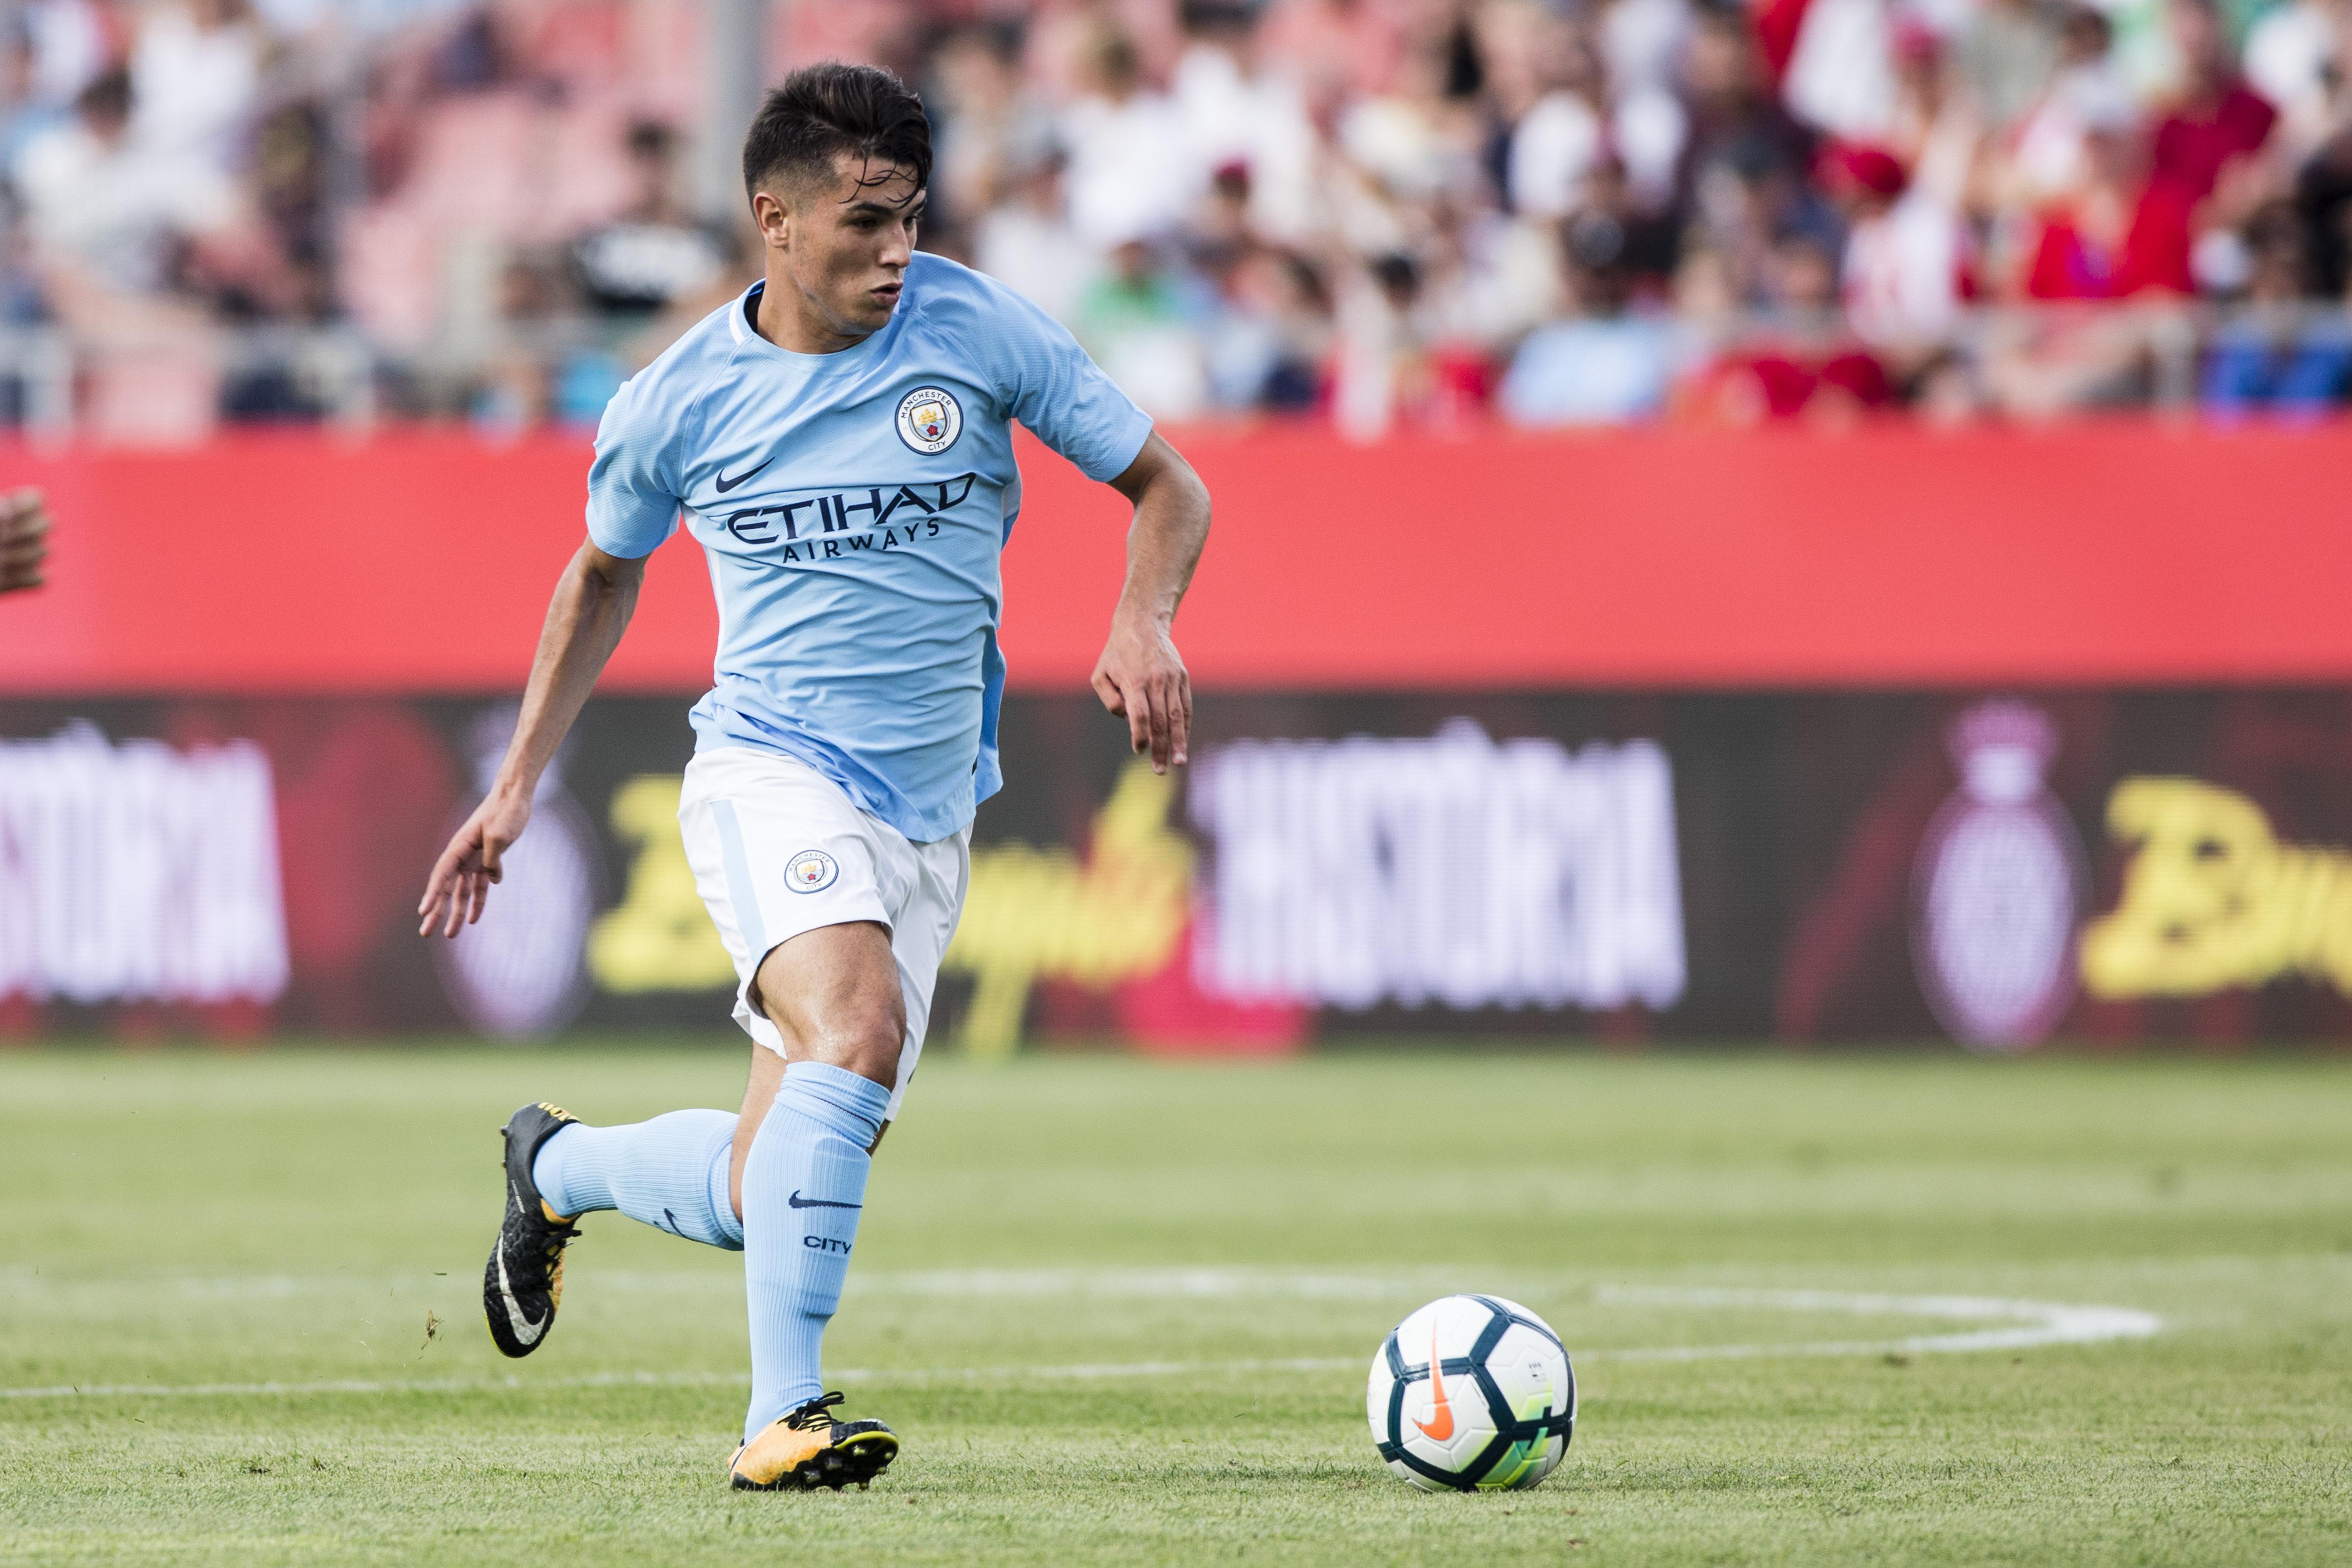 Man United v Man City: Guardiola identifies a key differential